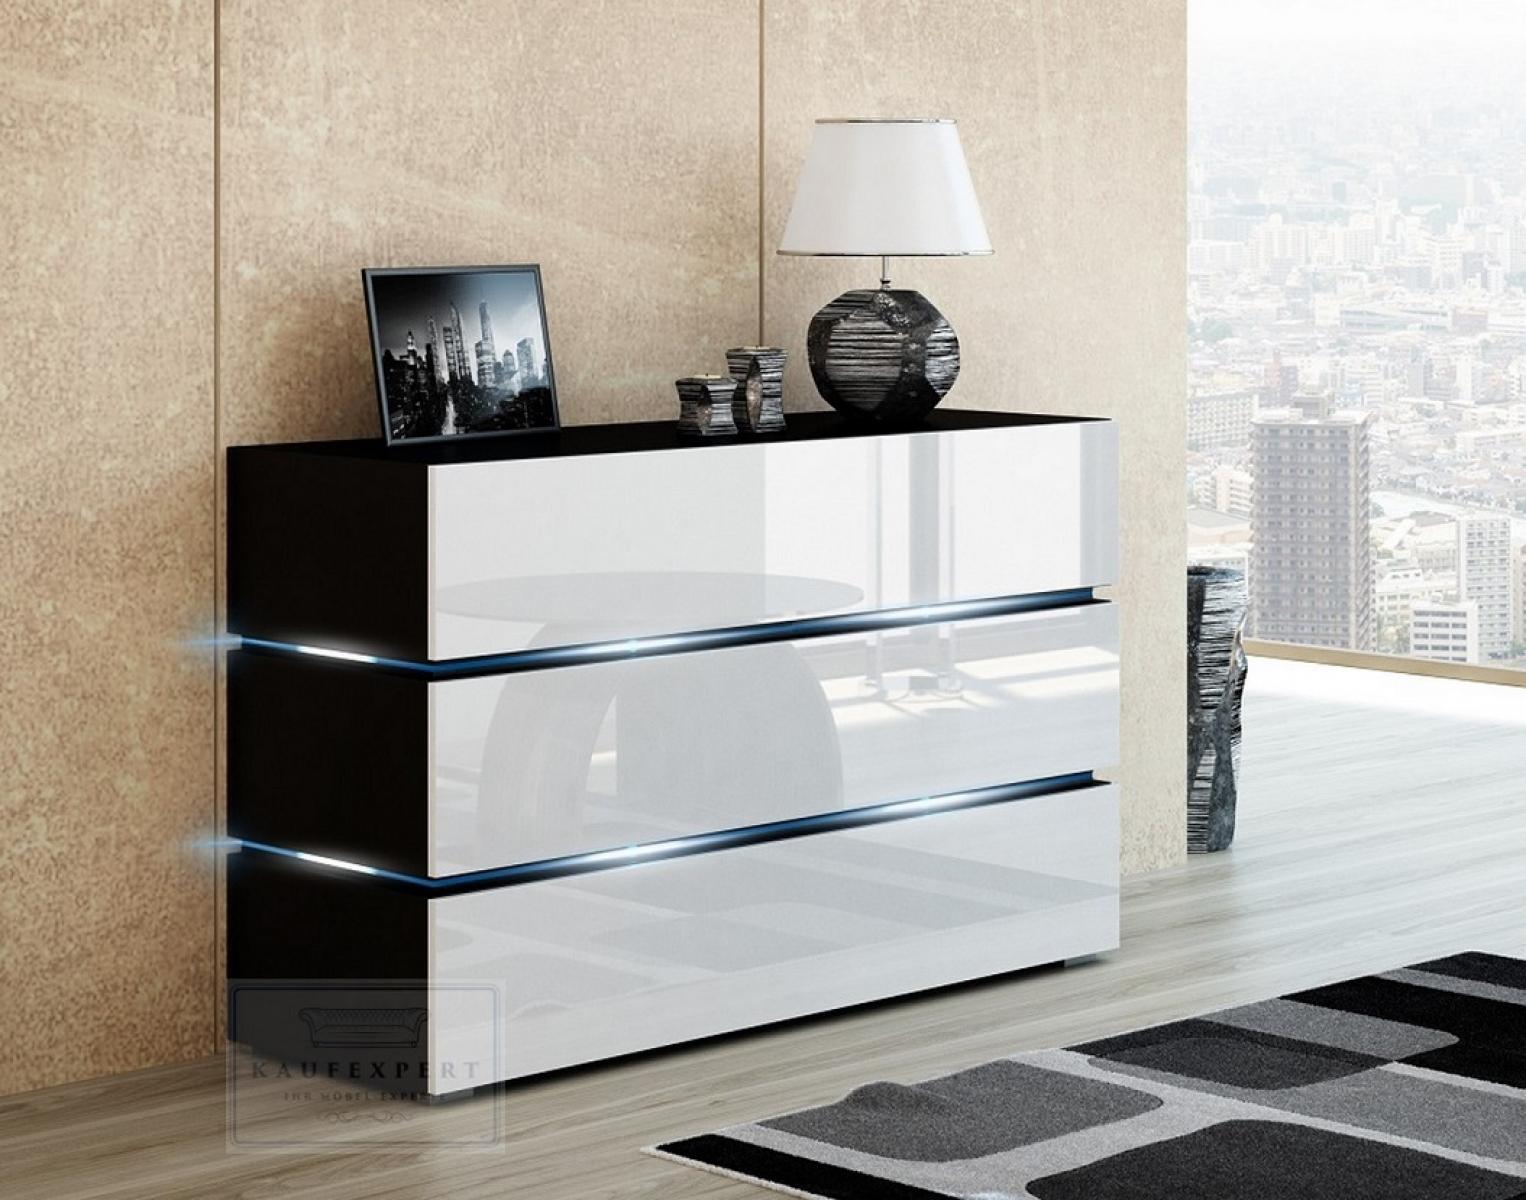 Kaufexpert Kommode Shine Sideboard 120 Cm Weiss Hochglanz Schwarz